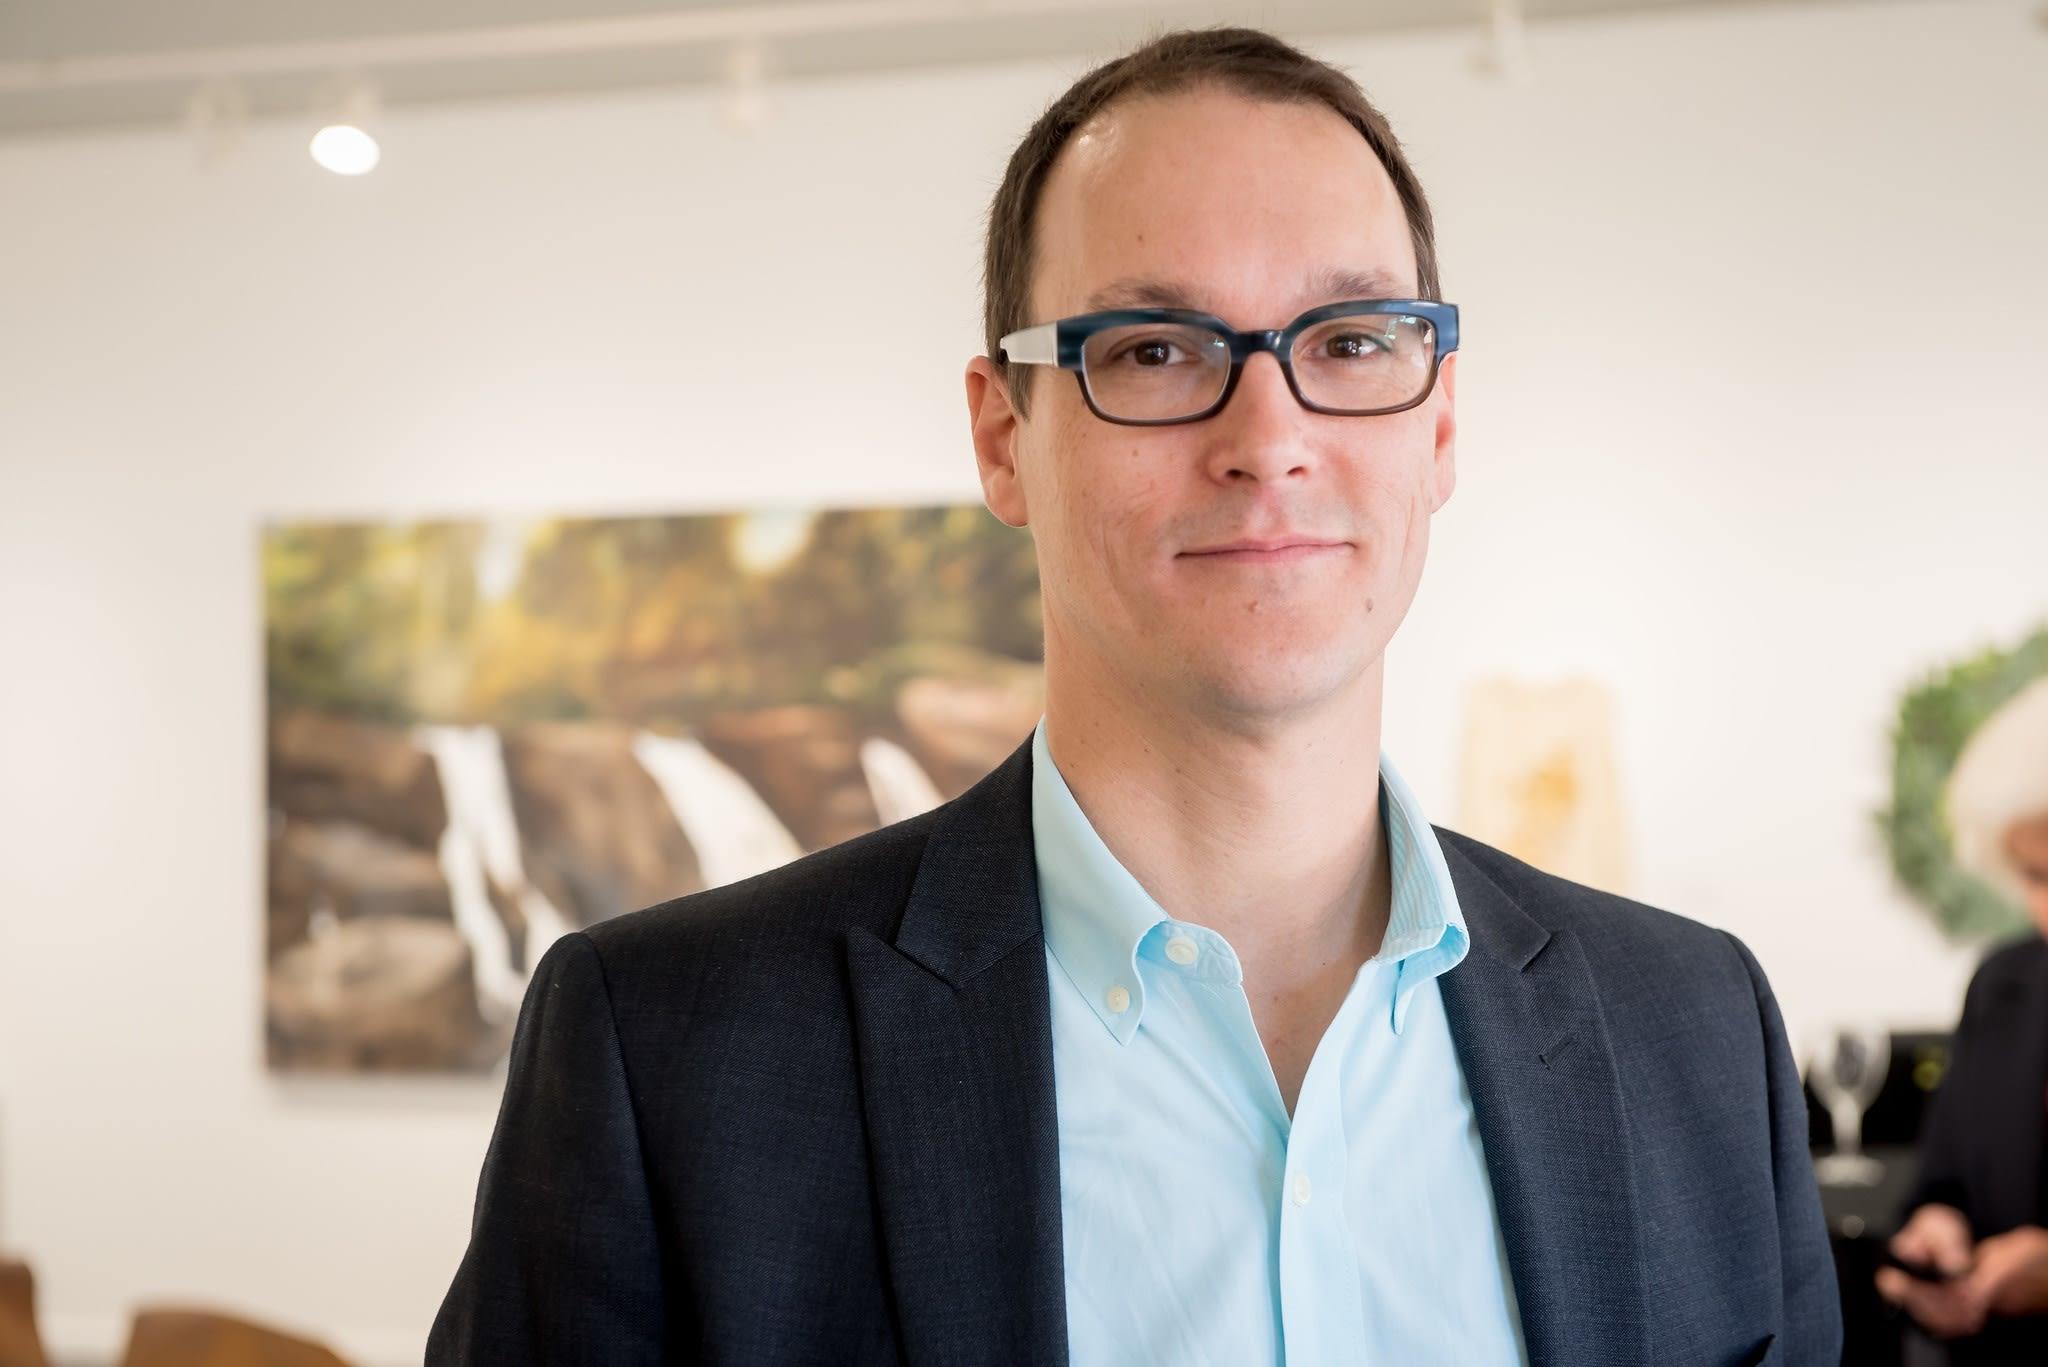 Jordan Ahlers, Owner/Director of Momentum Gallery